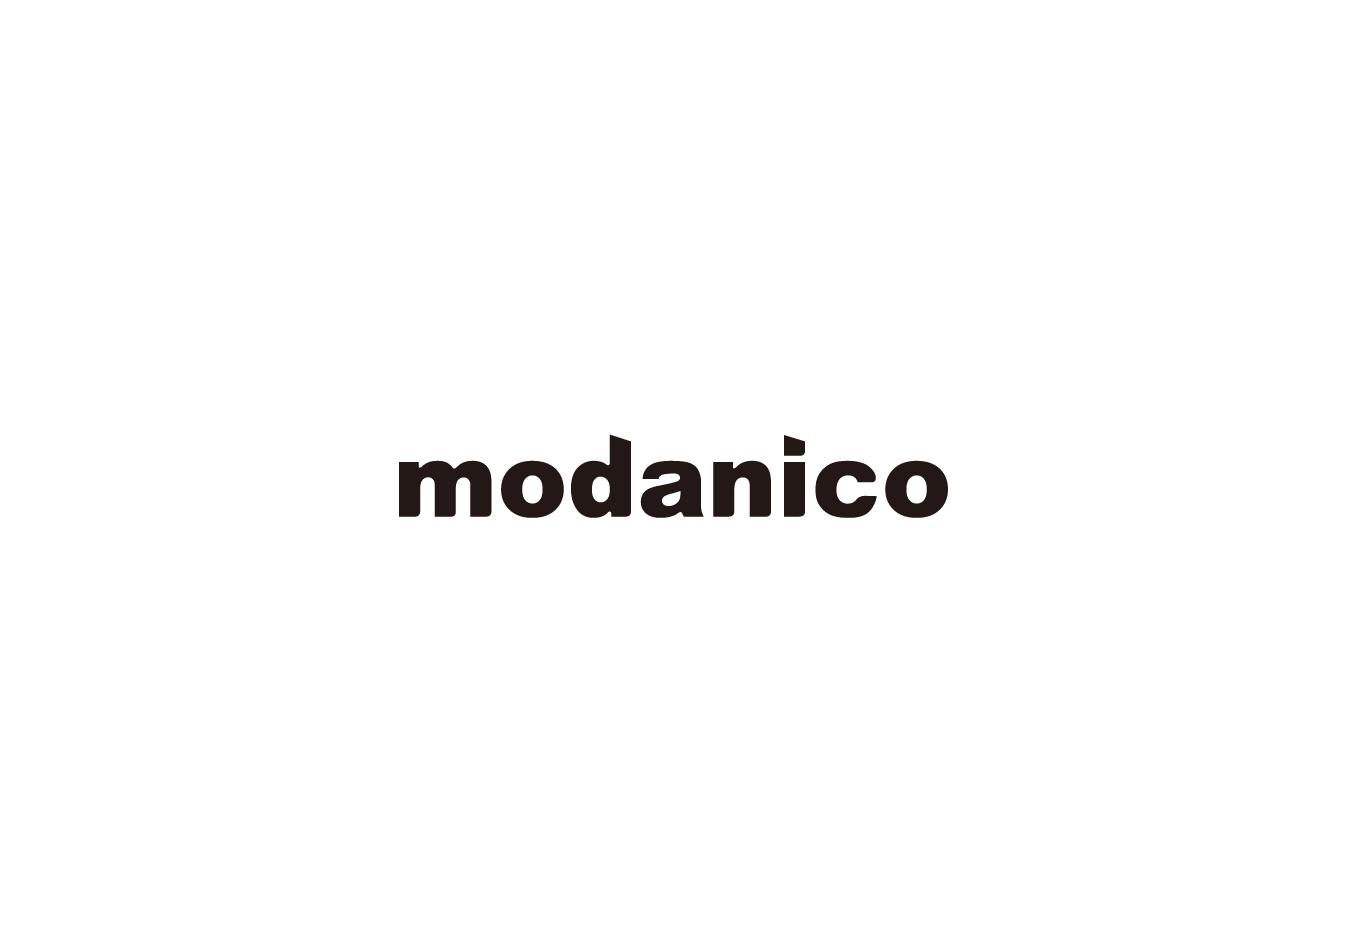 modanico_logotype